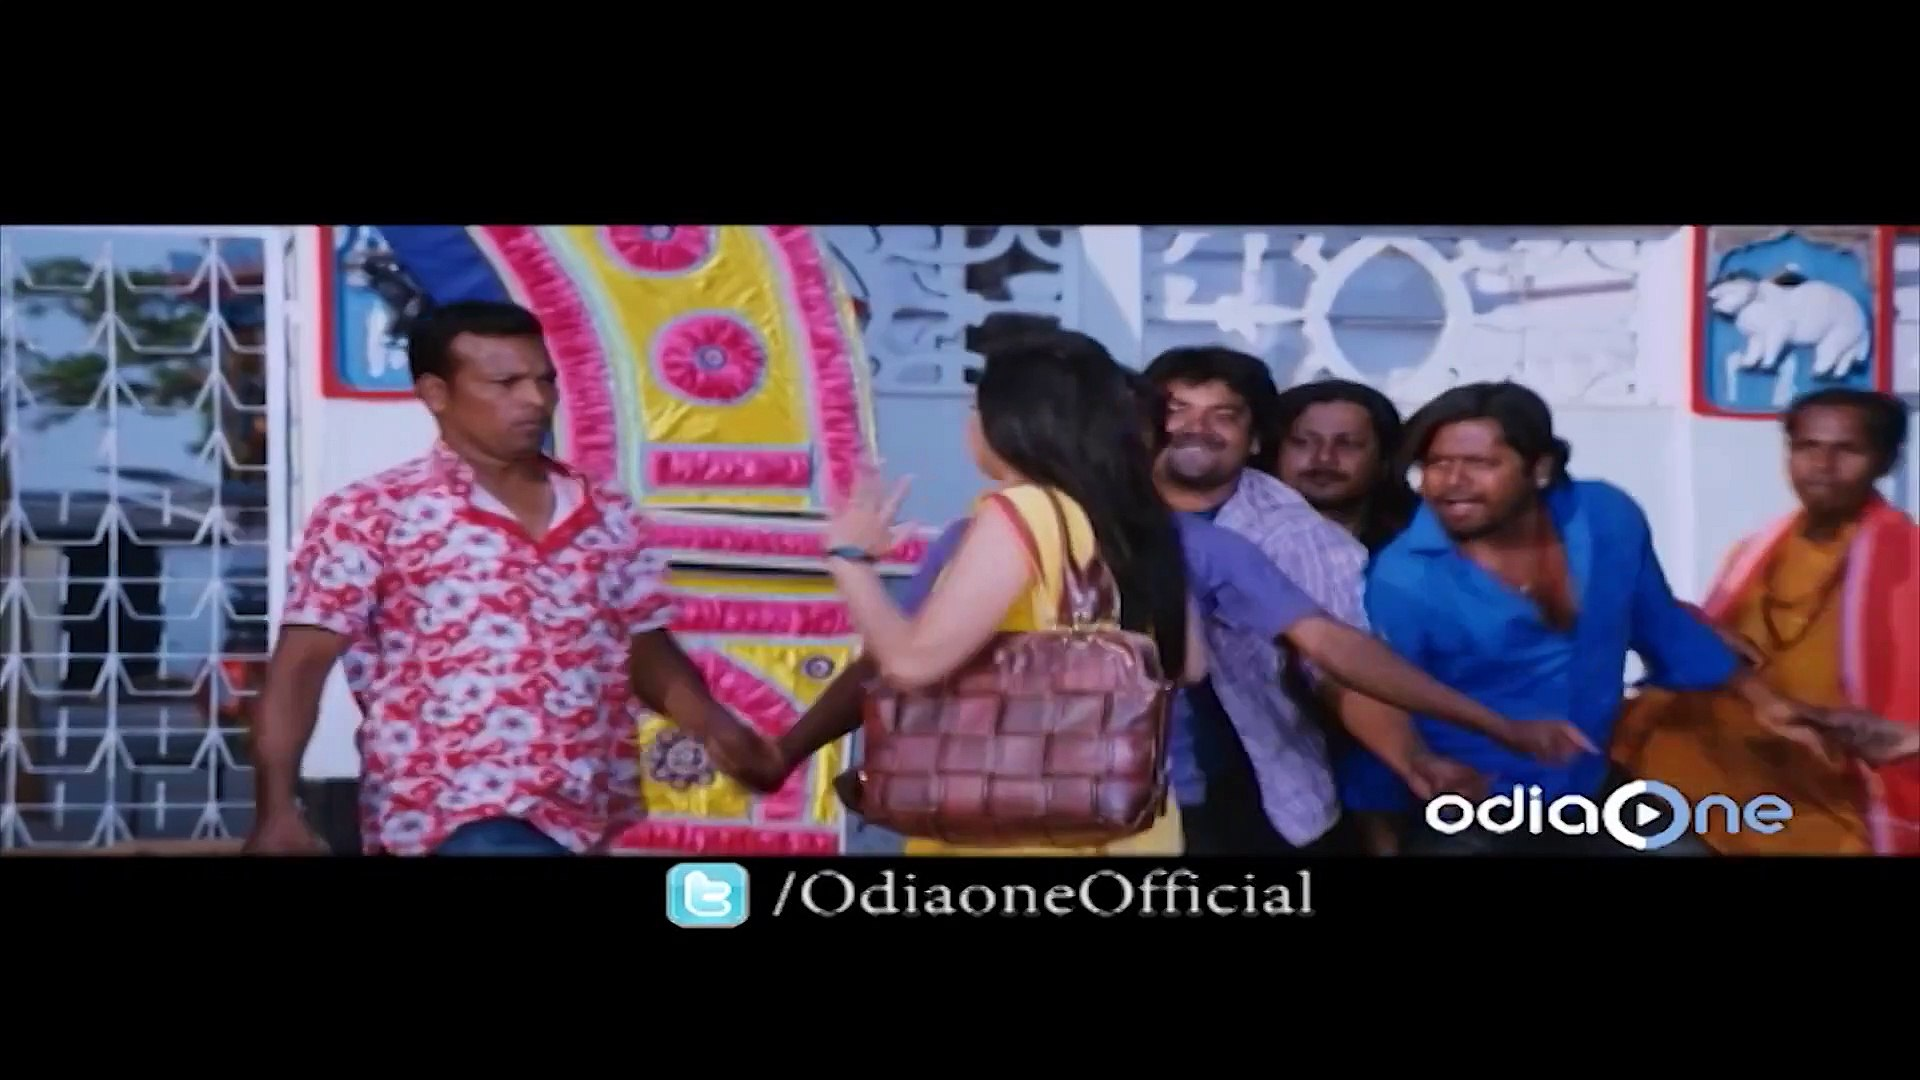 Toki Emiti Heuchi Video Song - Odia Movie -  Aame Ta Toka Sandha Marka  Film Video -  Papu PamPam -